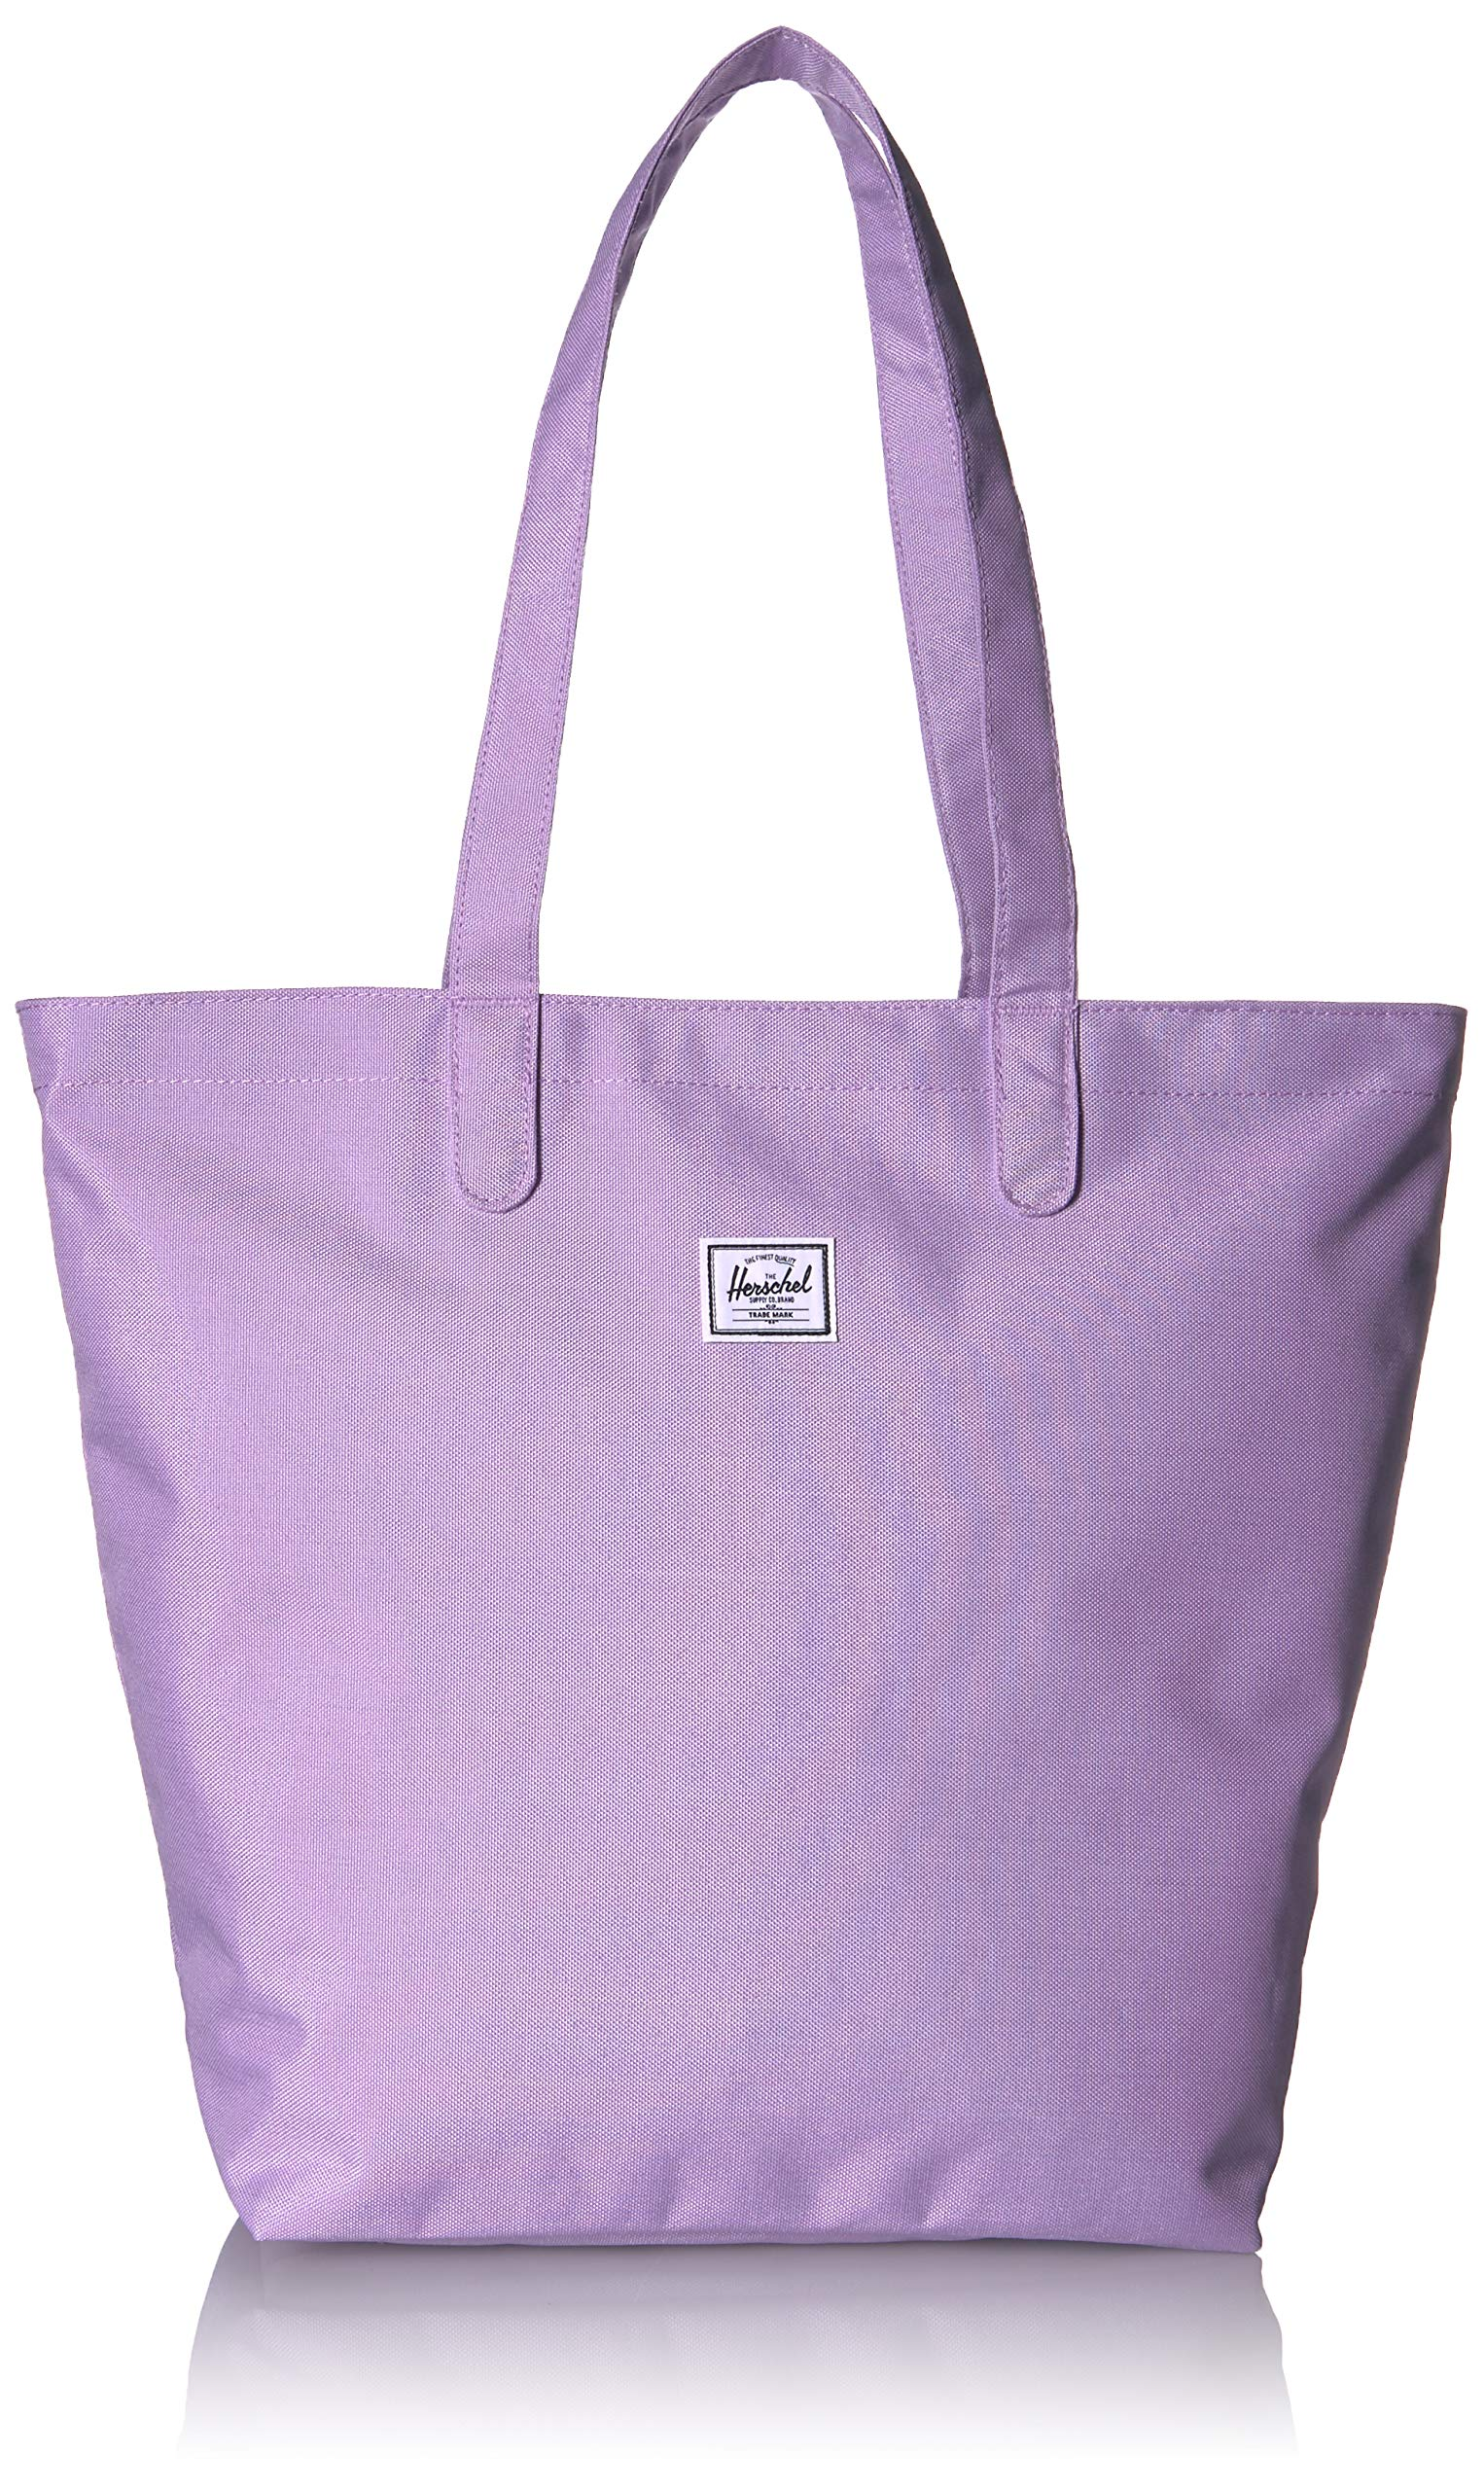 Herschel Mica Travel Tote Lavender Crosshatch One Size